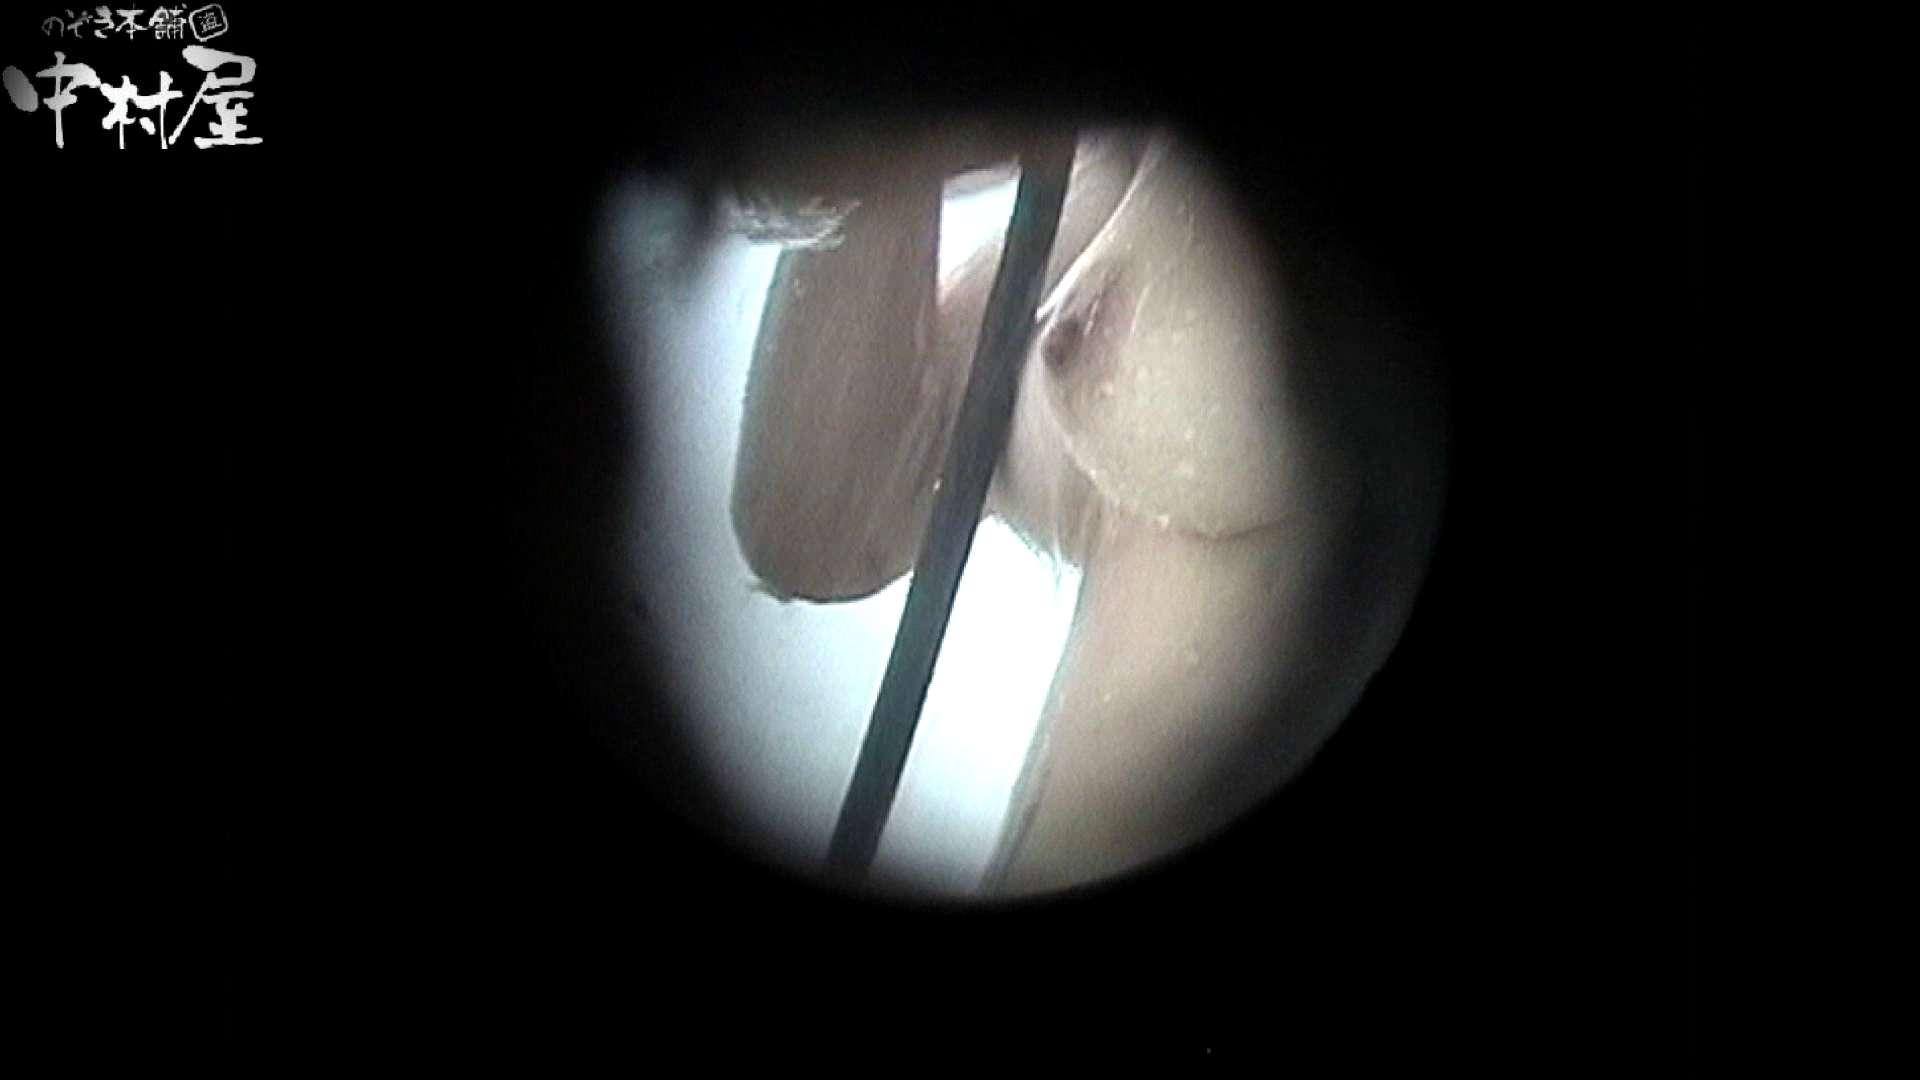 No.46 マシュマロ巨乳が目の前でプルプル 巨乳 おめこ無修正画像 78連発 63